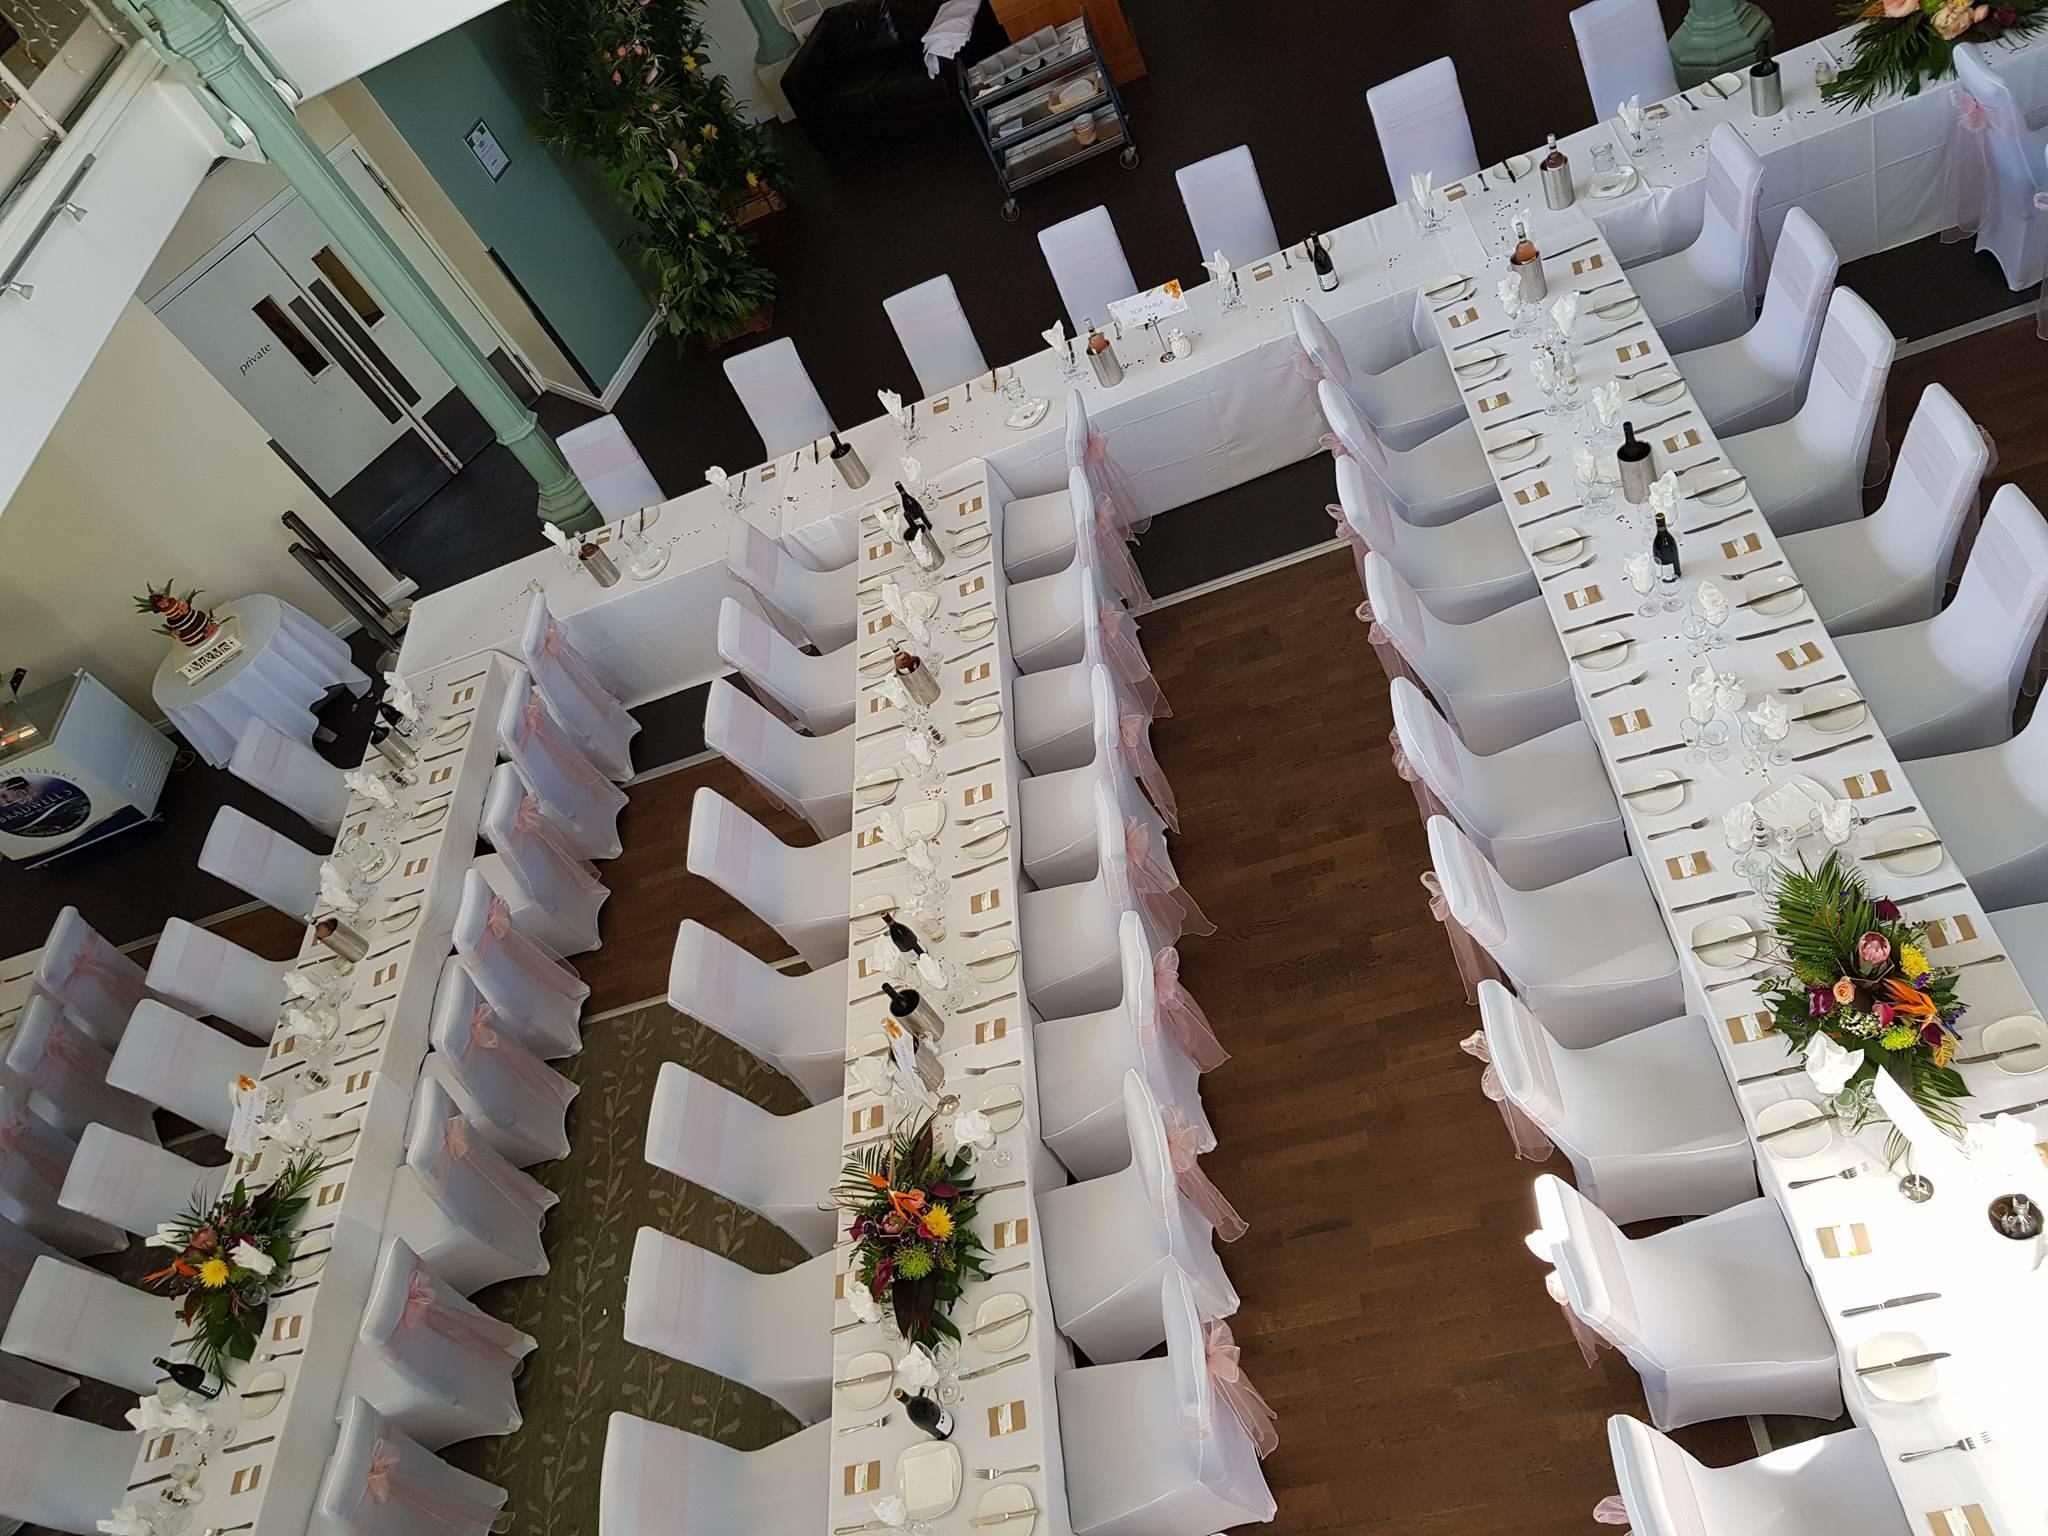 Cheshire Wedding Decor